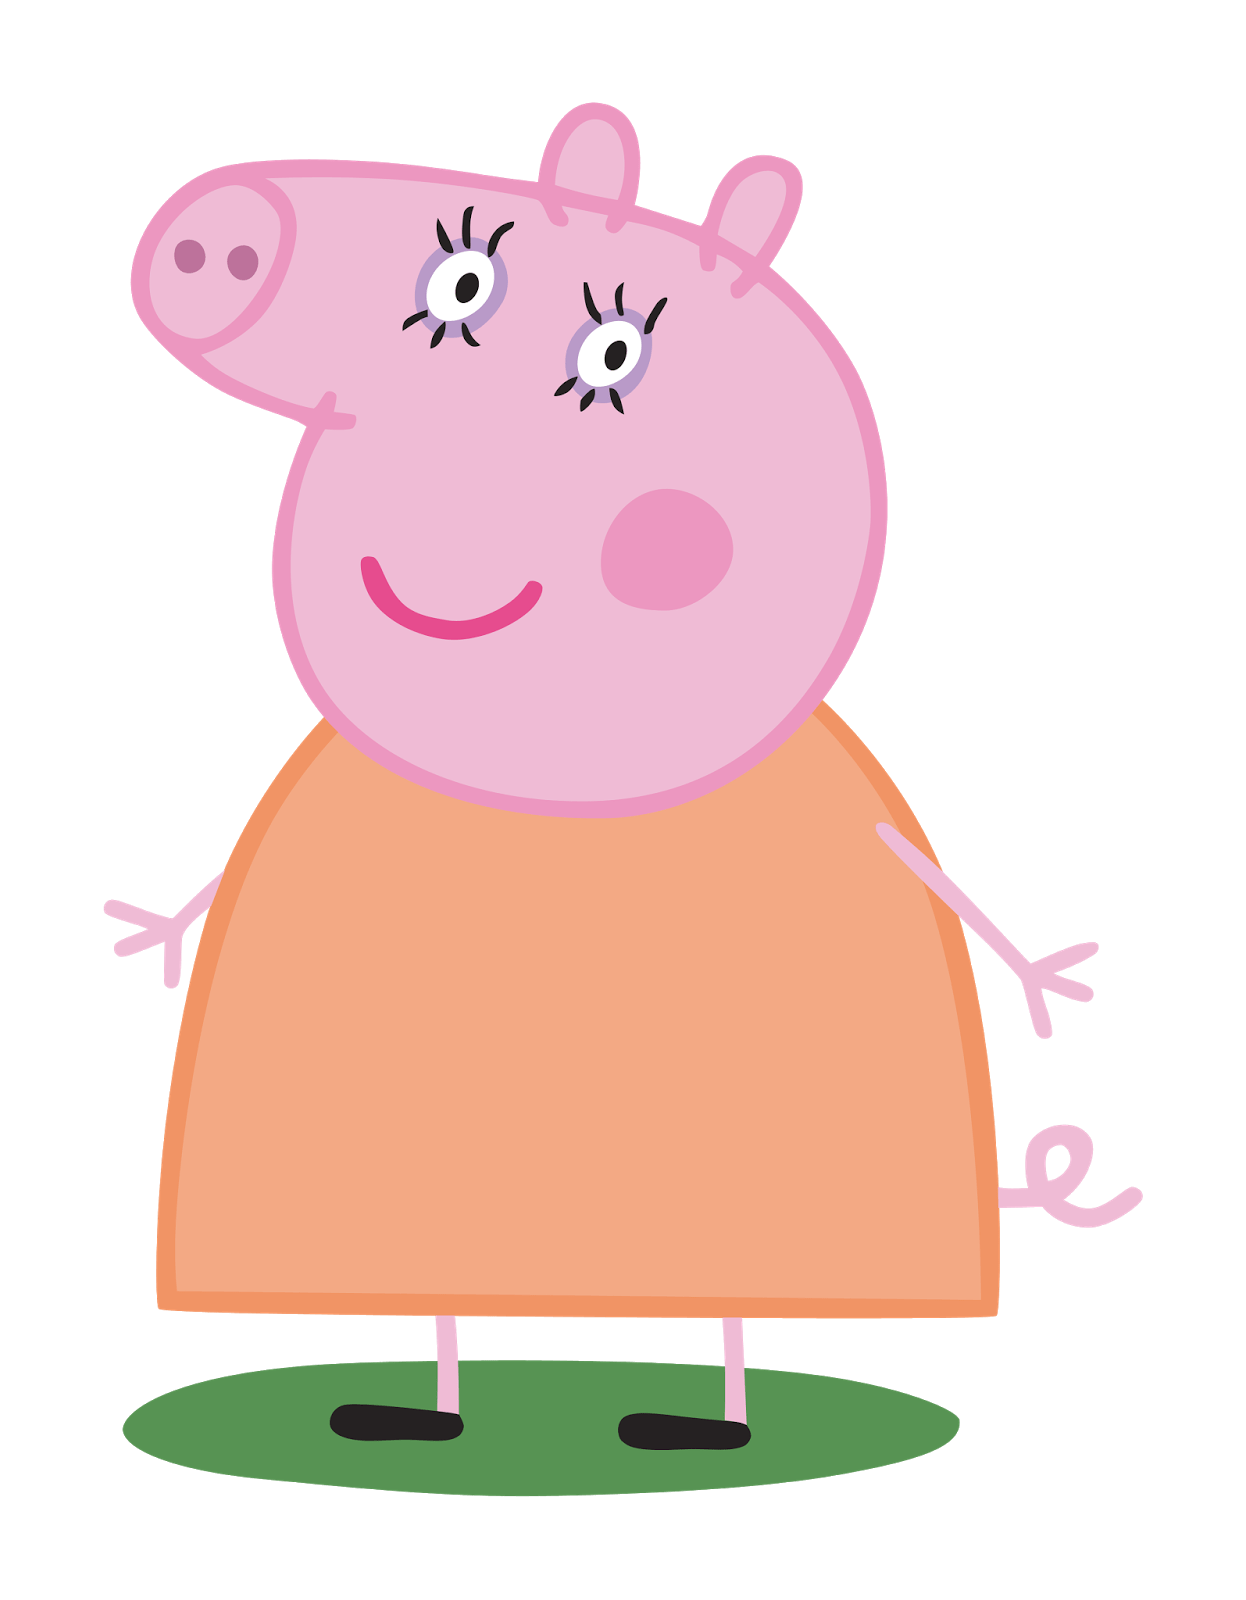 Mummy Pig Transparent Png Stickpng Peppa Pig Images Mummy Pig Peppa Pig Cartoon